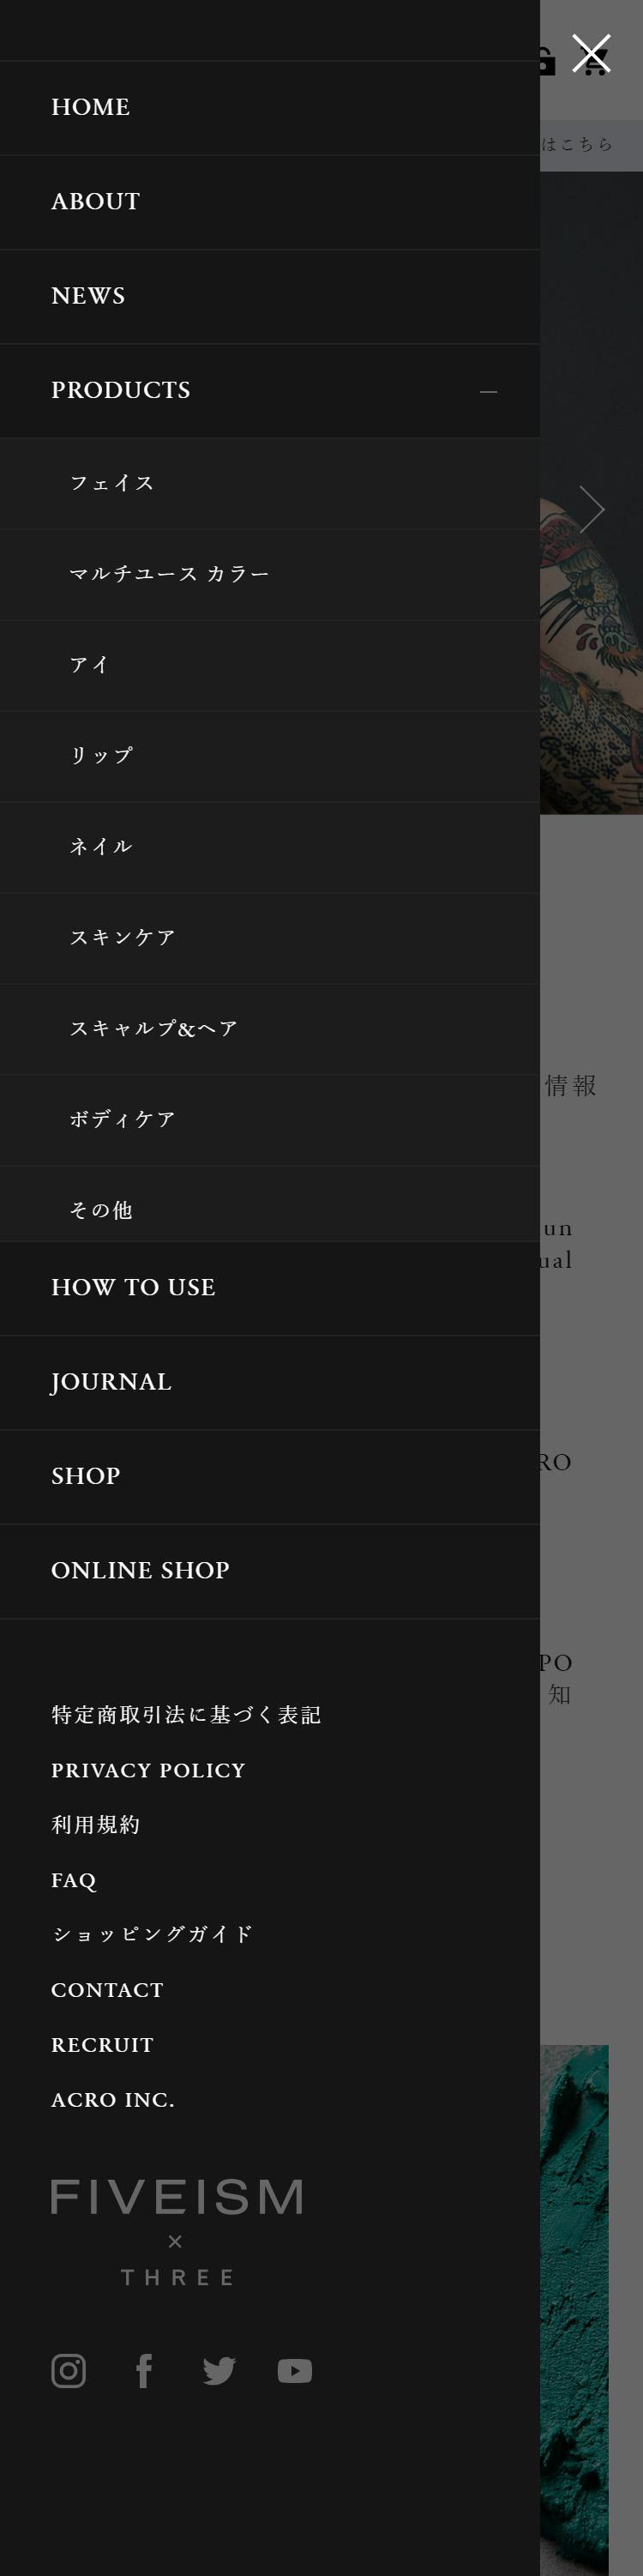 FIVEISM × THREE 公式オンラインショップ メニュー